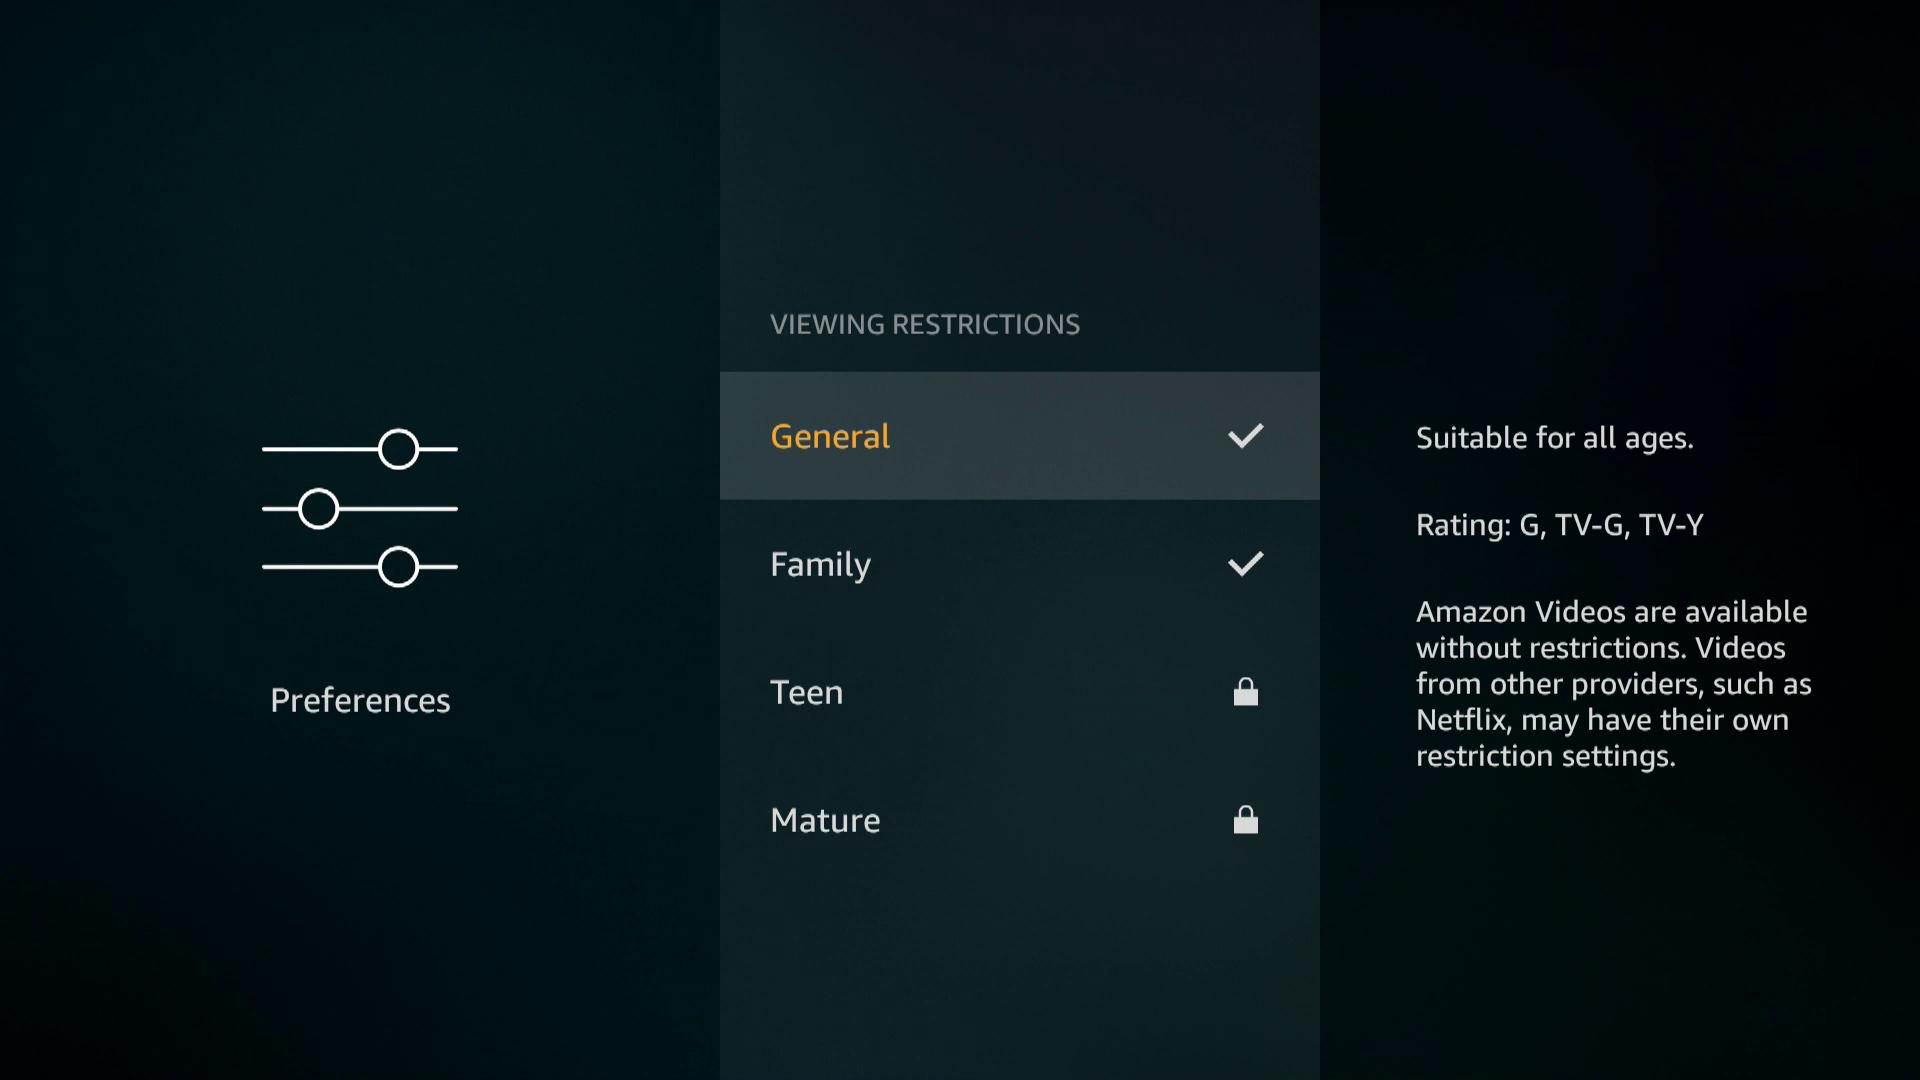 A screenshot of viewing restrictions on a Firestick.